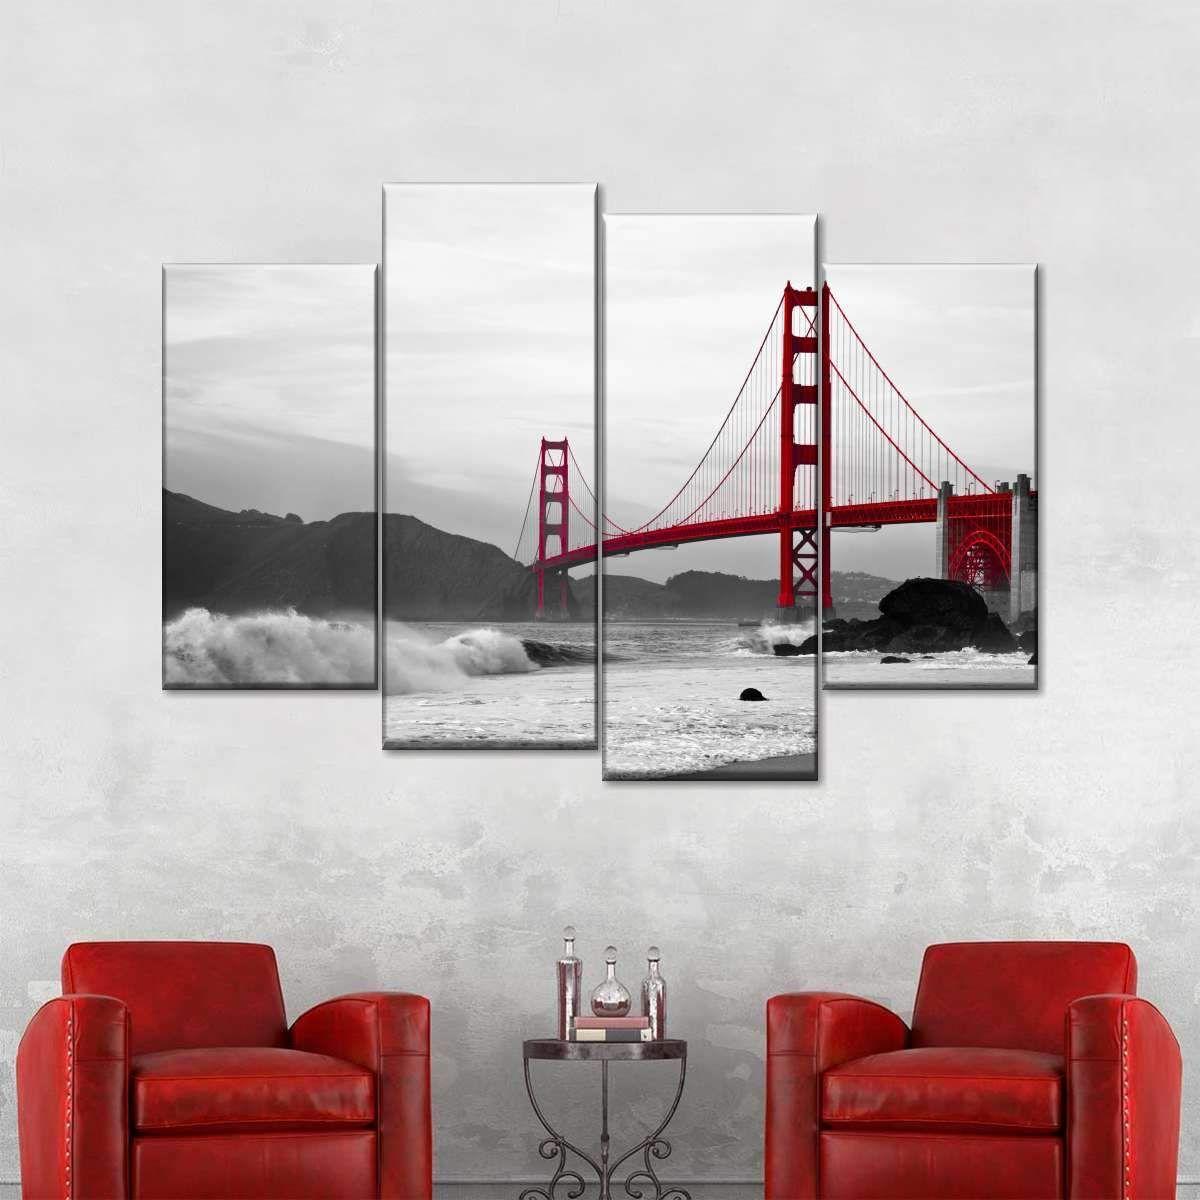 Shore At Golden Gate Bridge Pop Multi Panel Canvas Wall Art In 2020 Multi Panel Canvas Canvas Wall Art Wall Art Canvas Prints